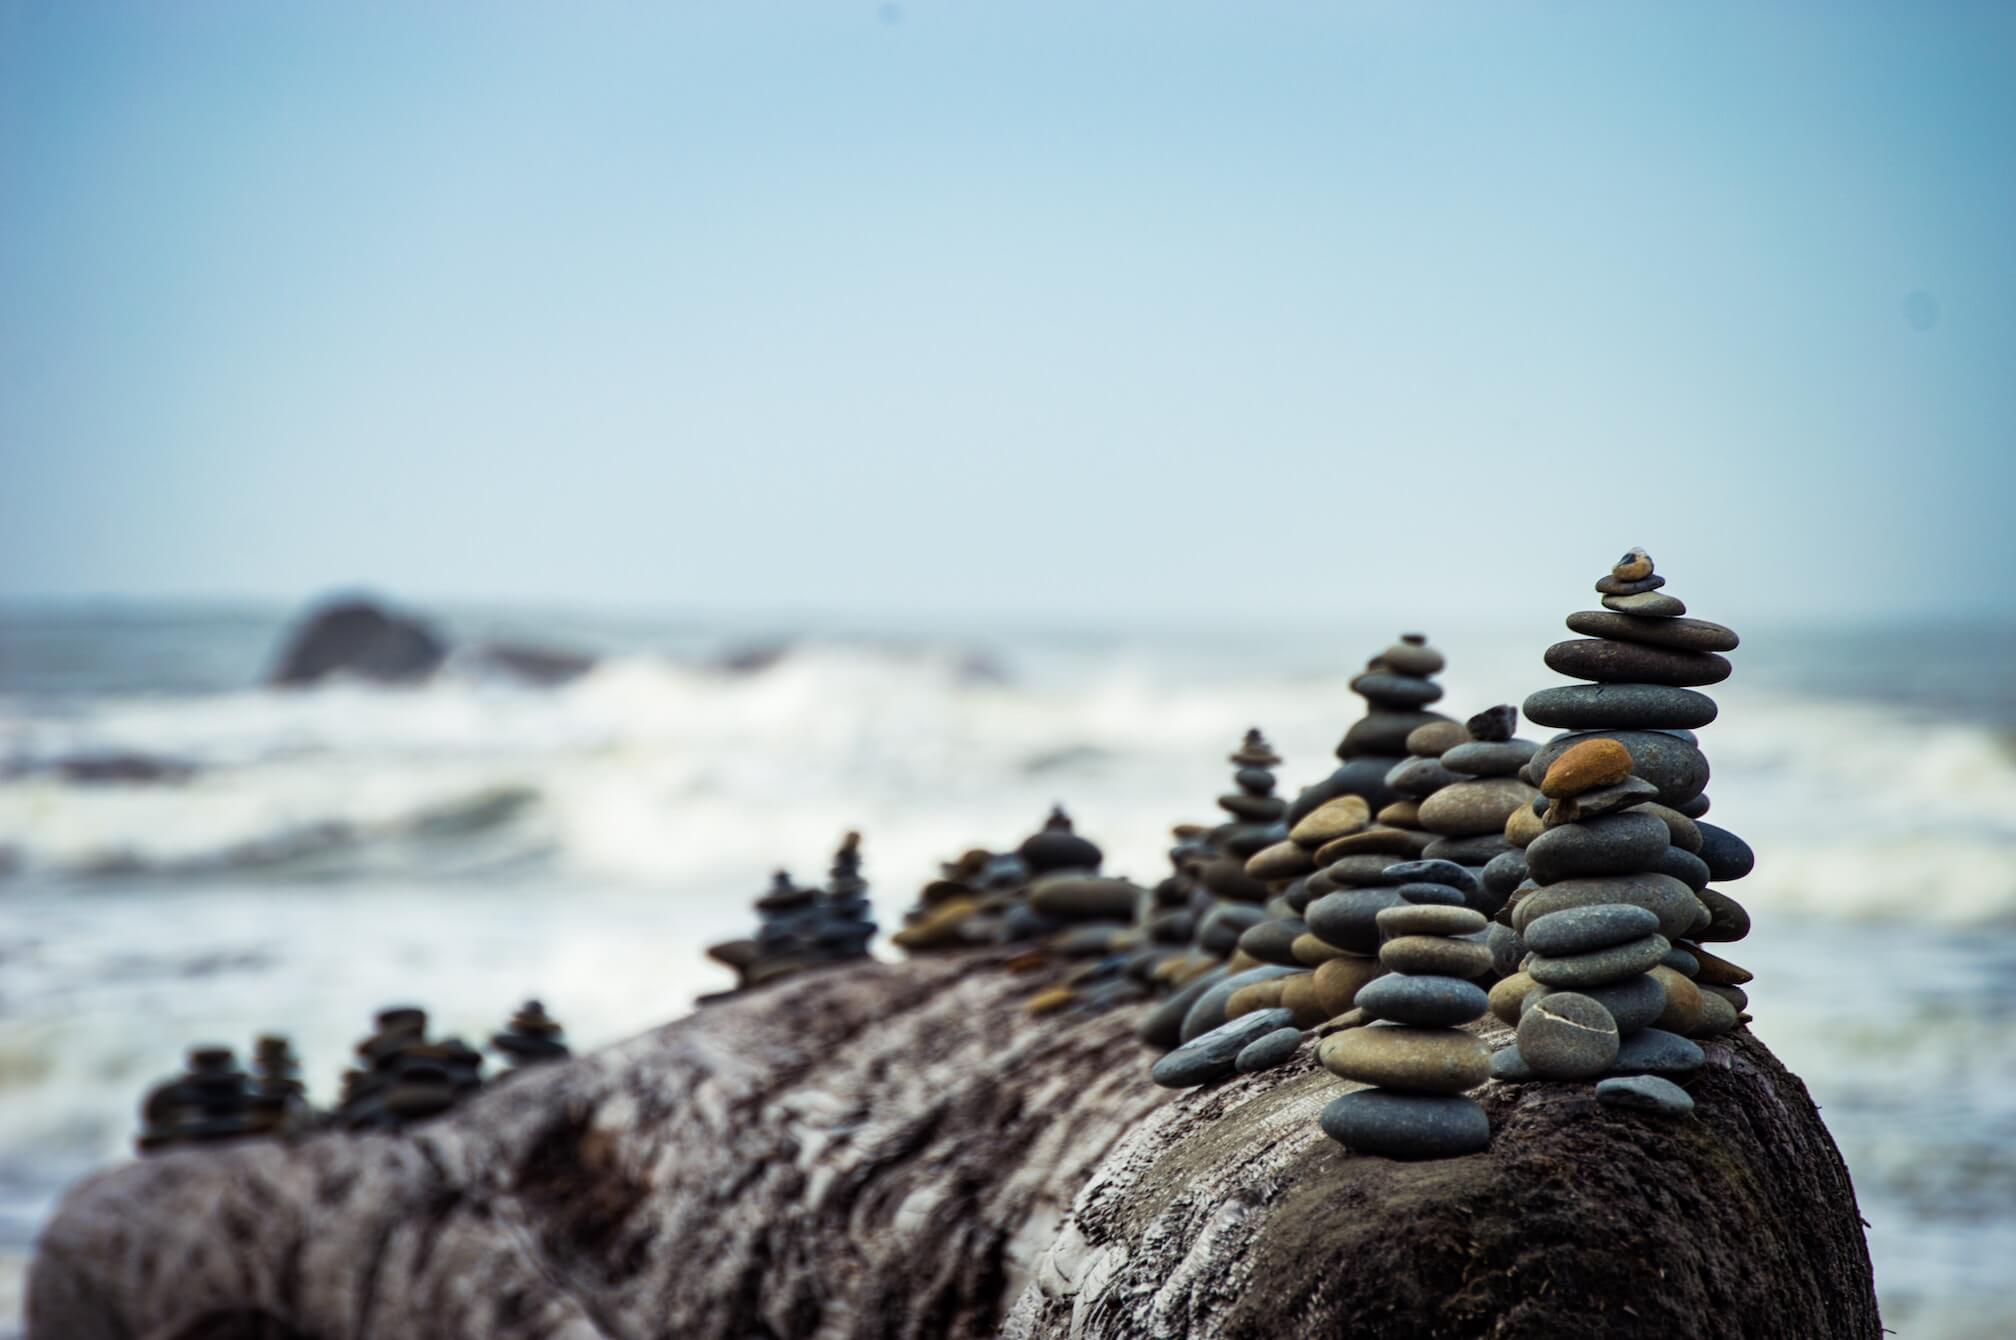 piles of pebbles balanced in front of ocean